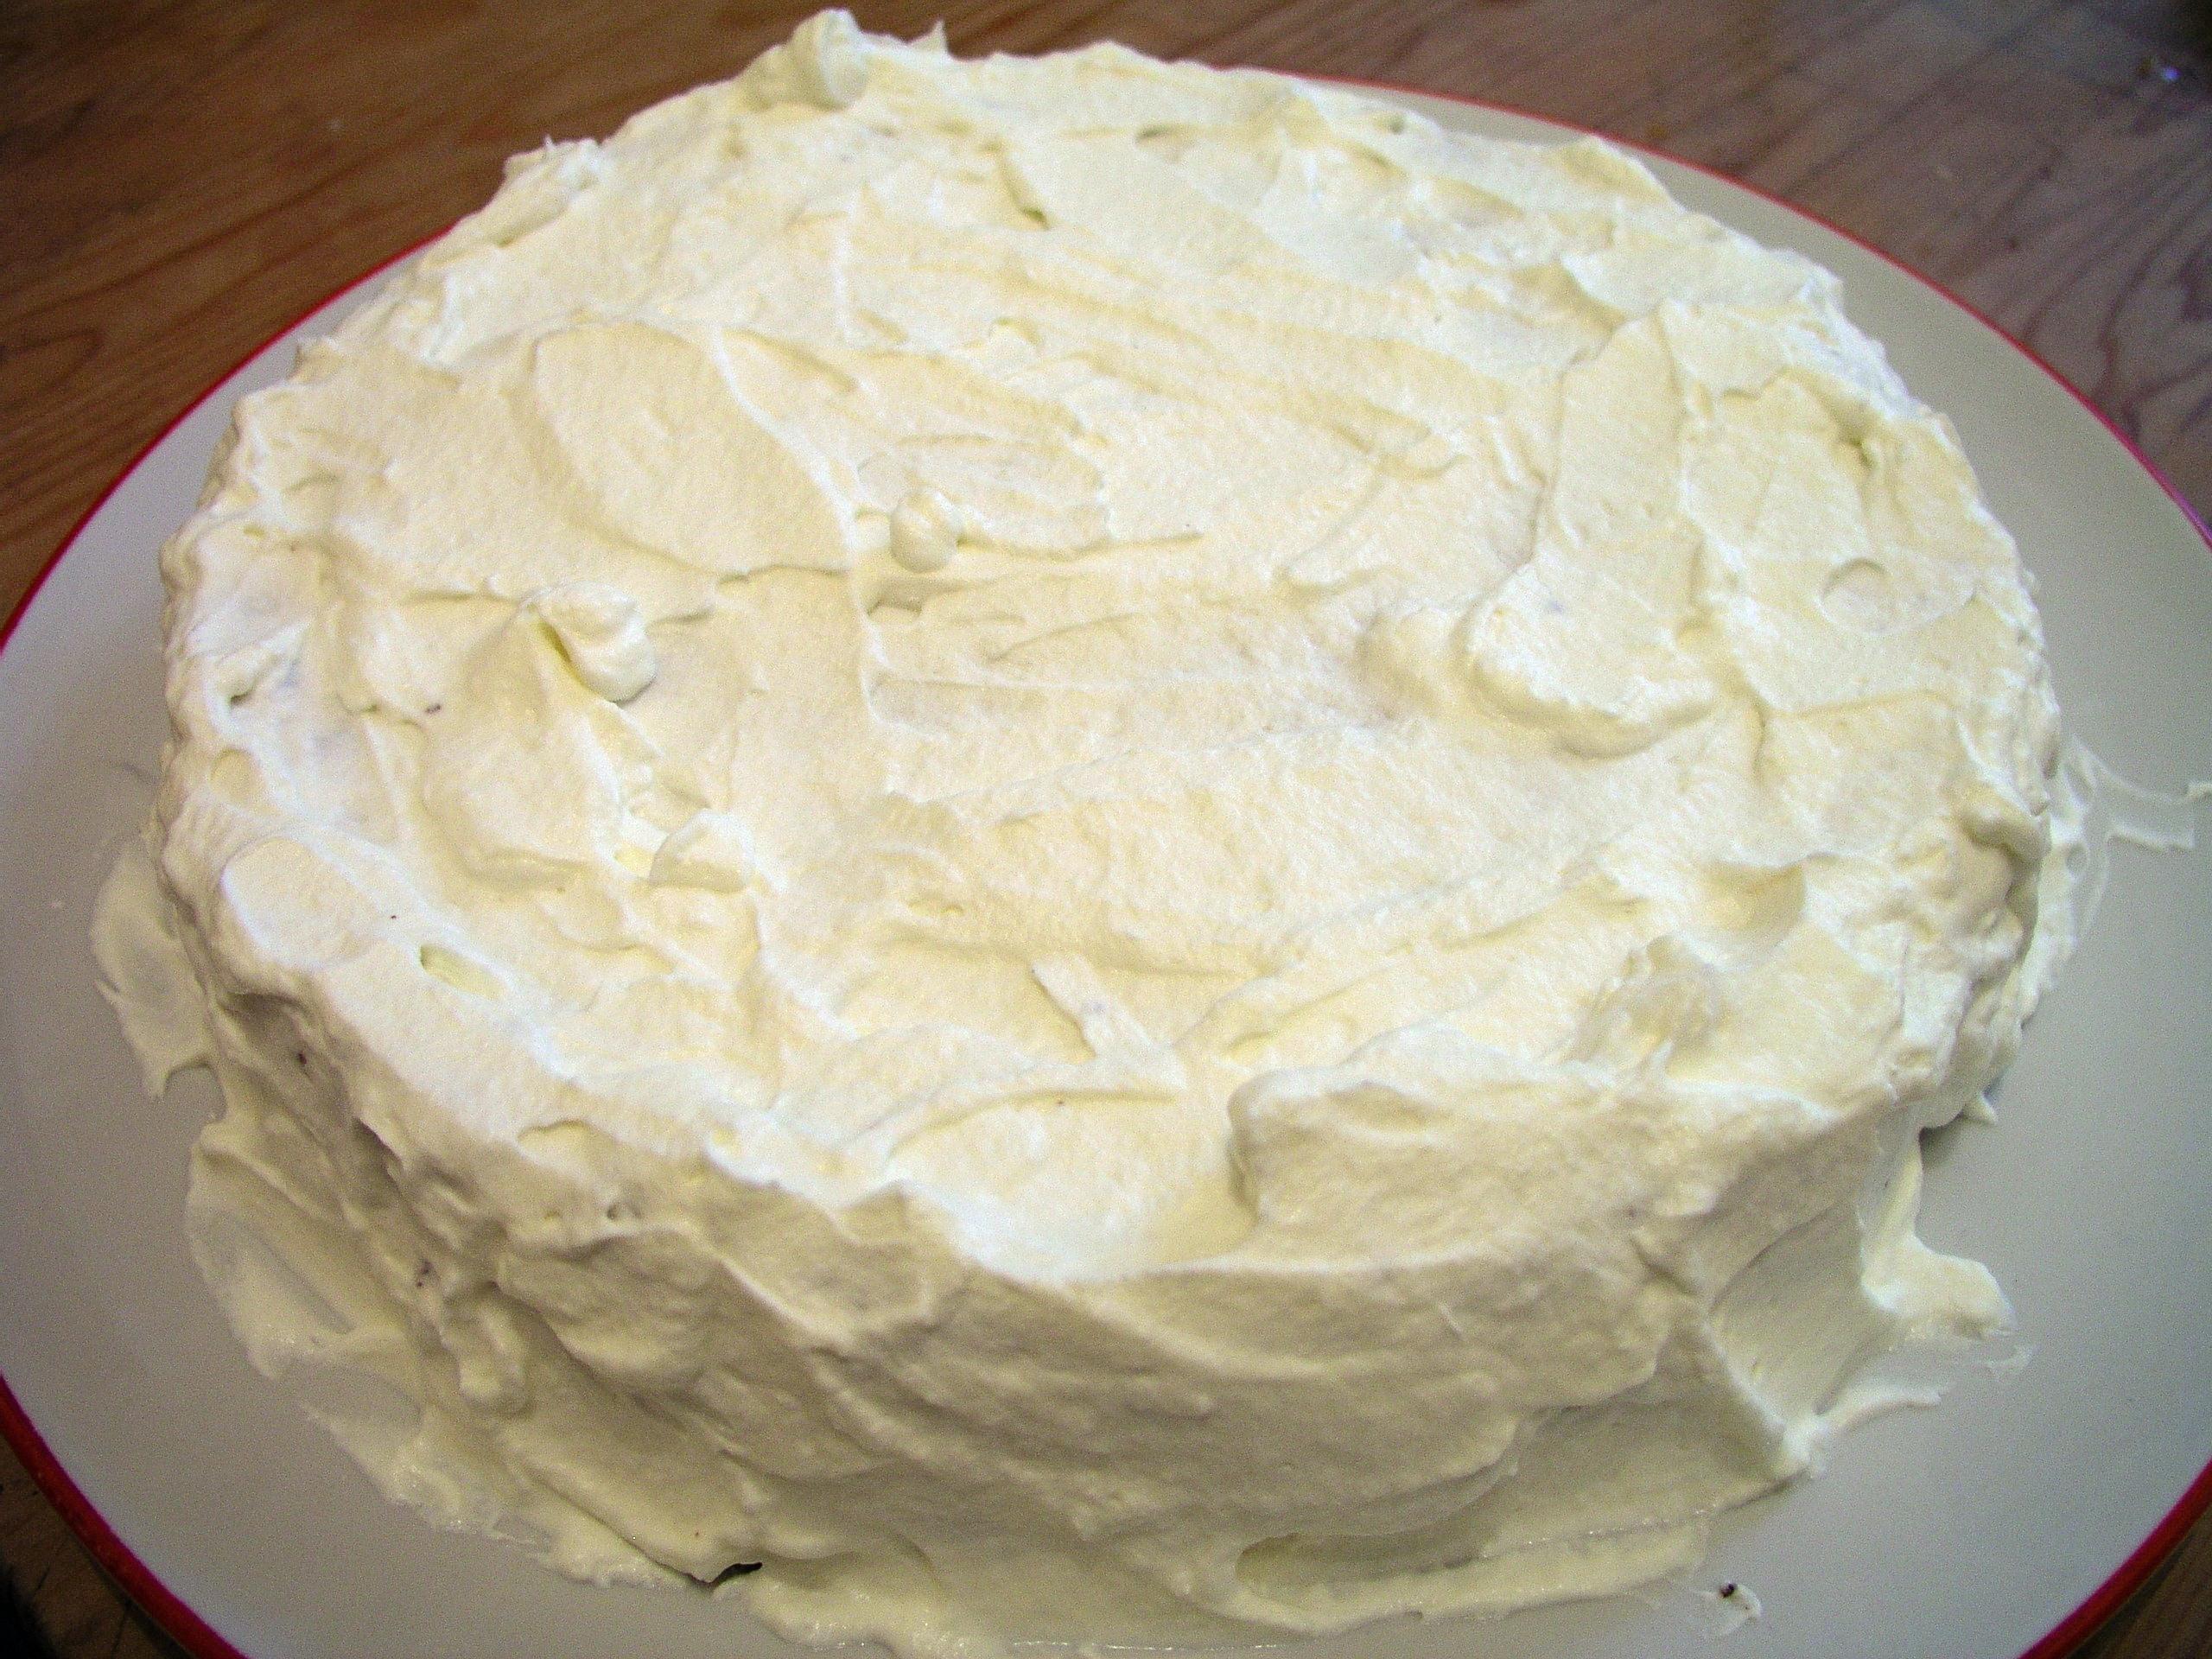 File:Layered cake with cream.JPG - Wikimedia Commons